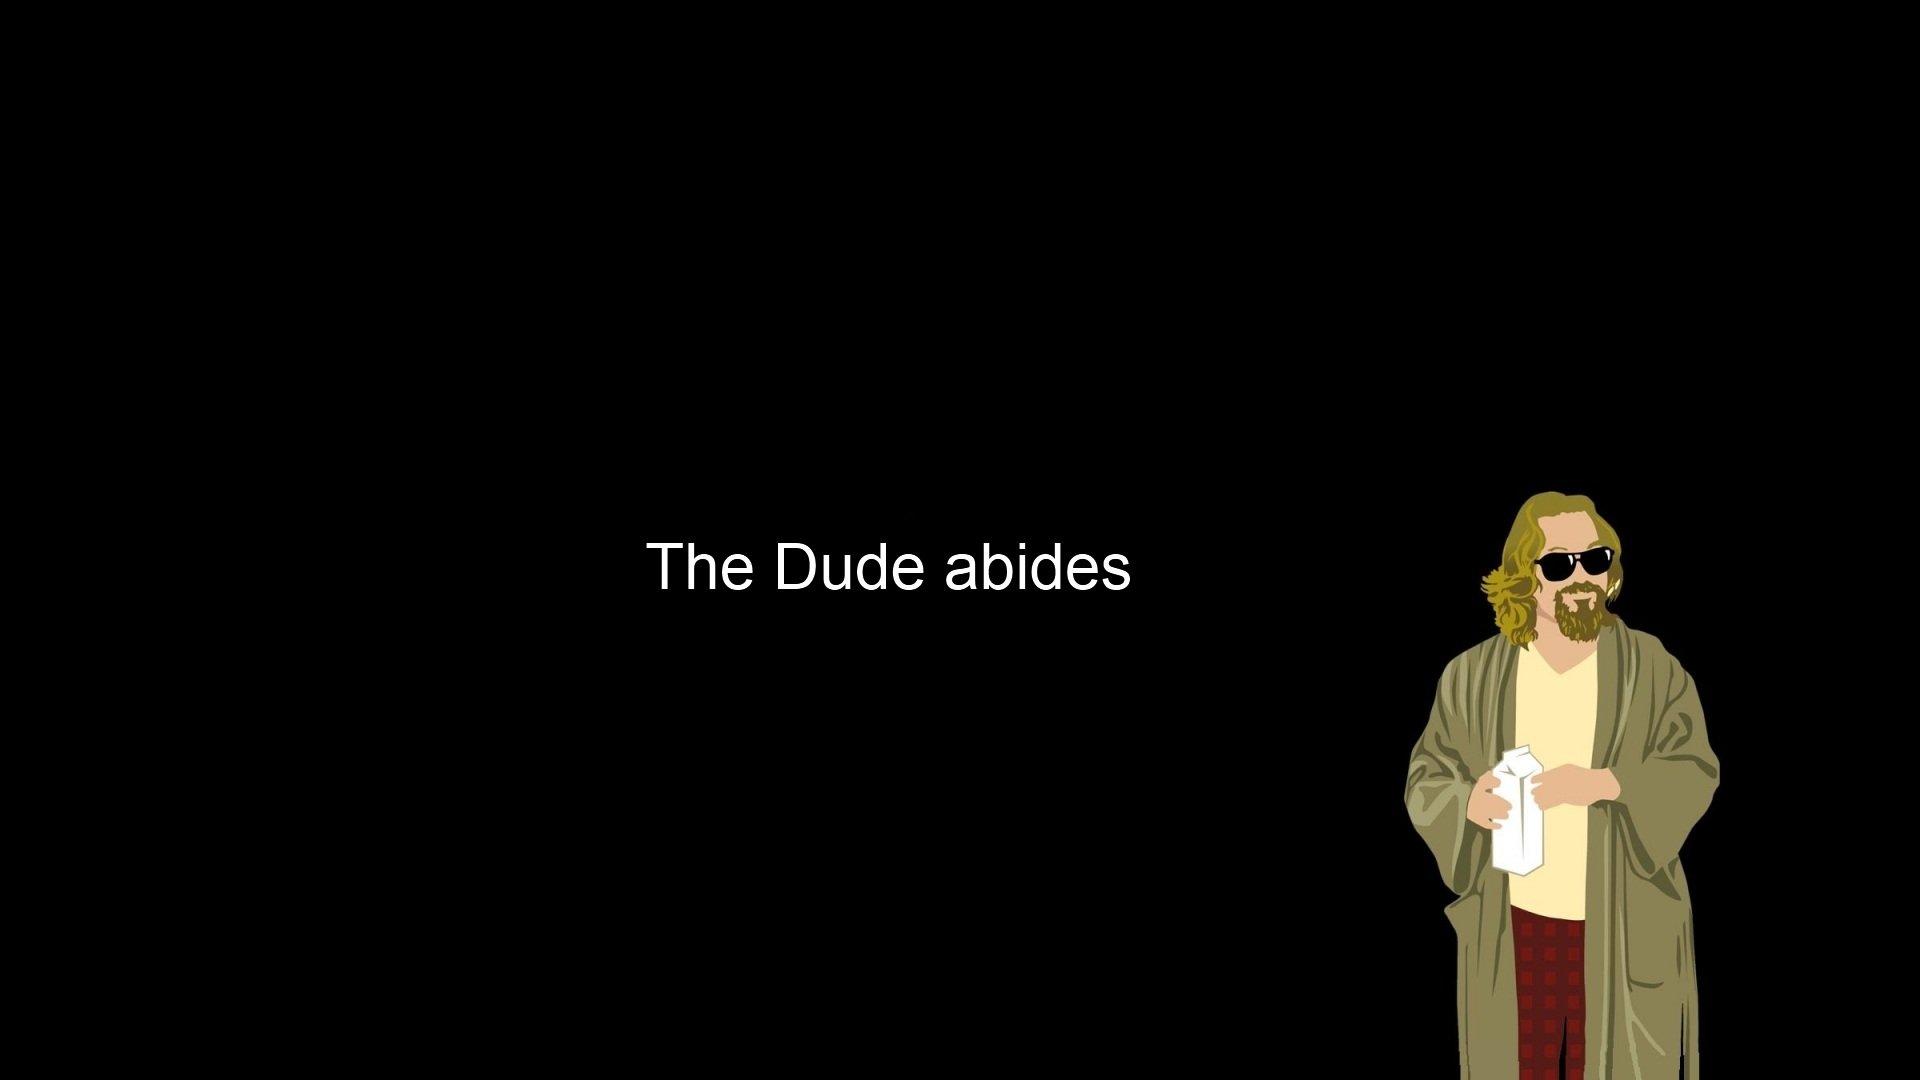 Minimalistic The Dude The Big Lebowski wallpaper 1920x1080 335490 1920x1080